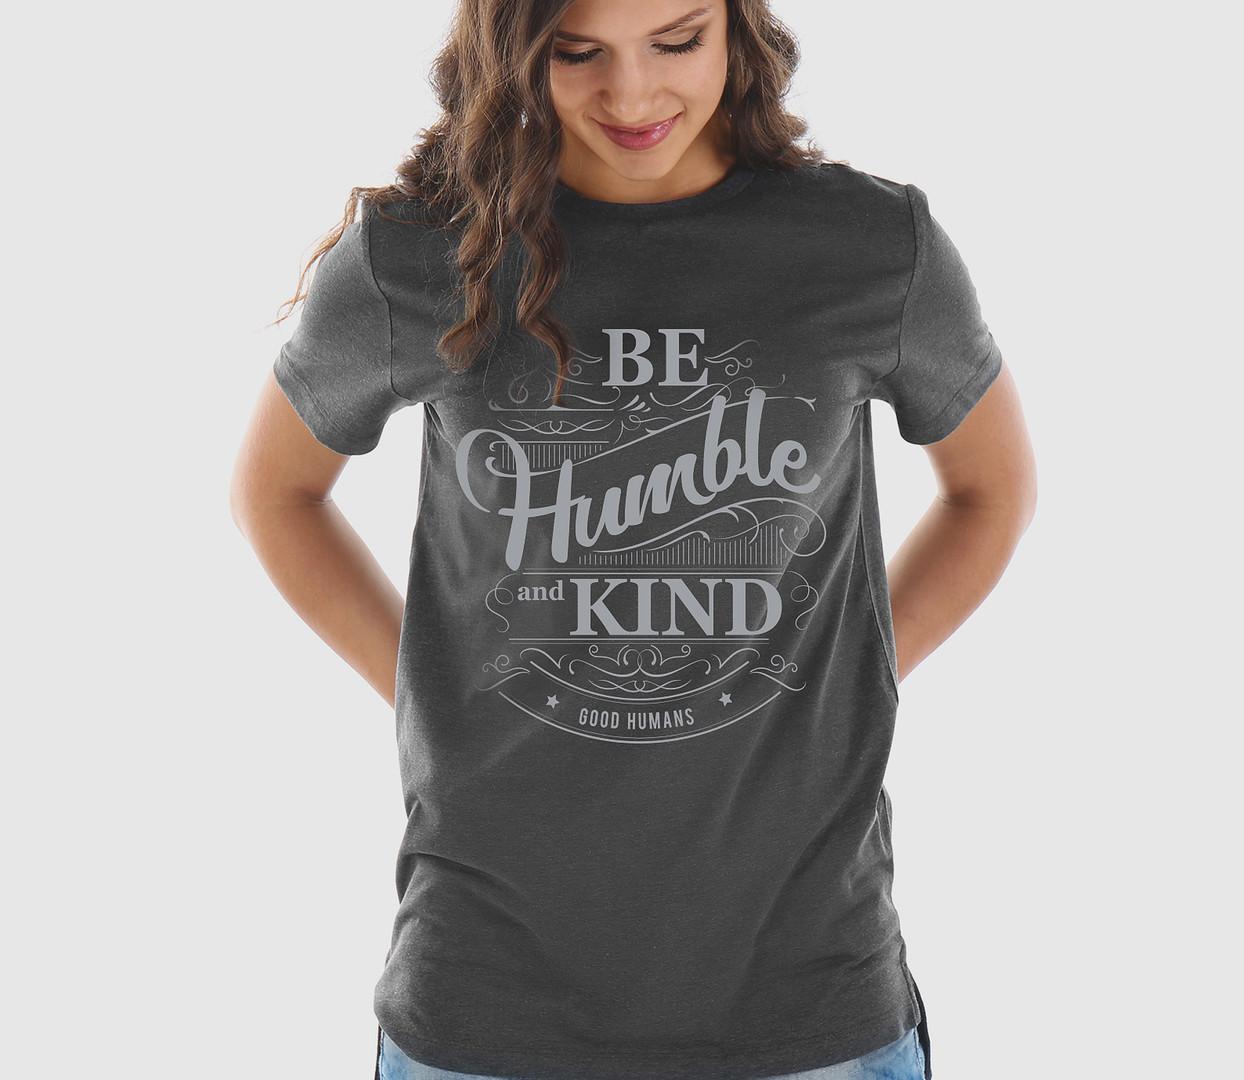 Be Humble shopify image2.jpg